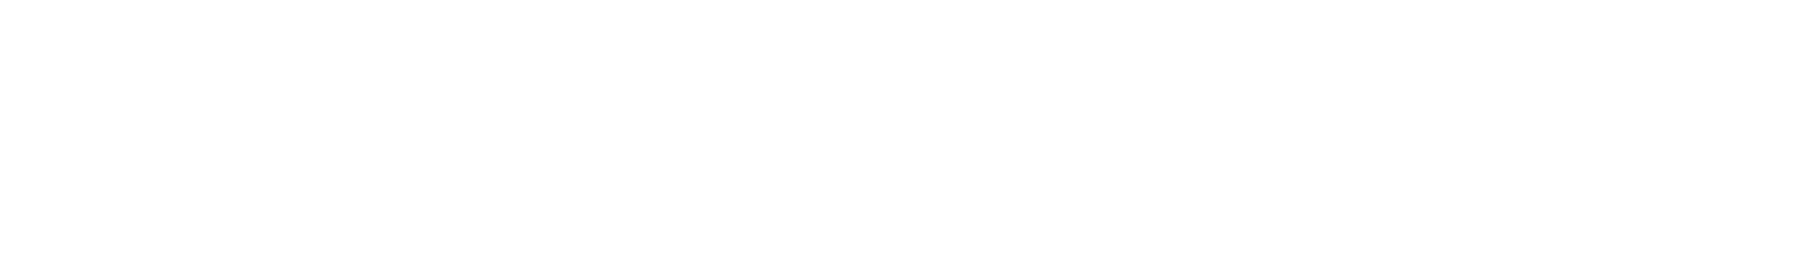 drums current